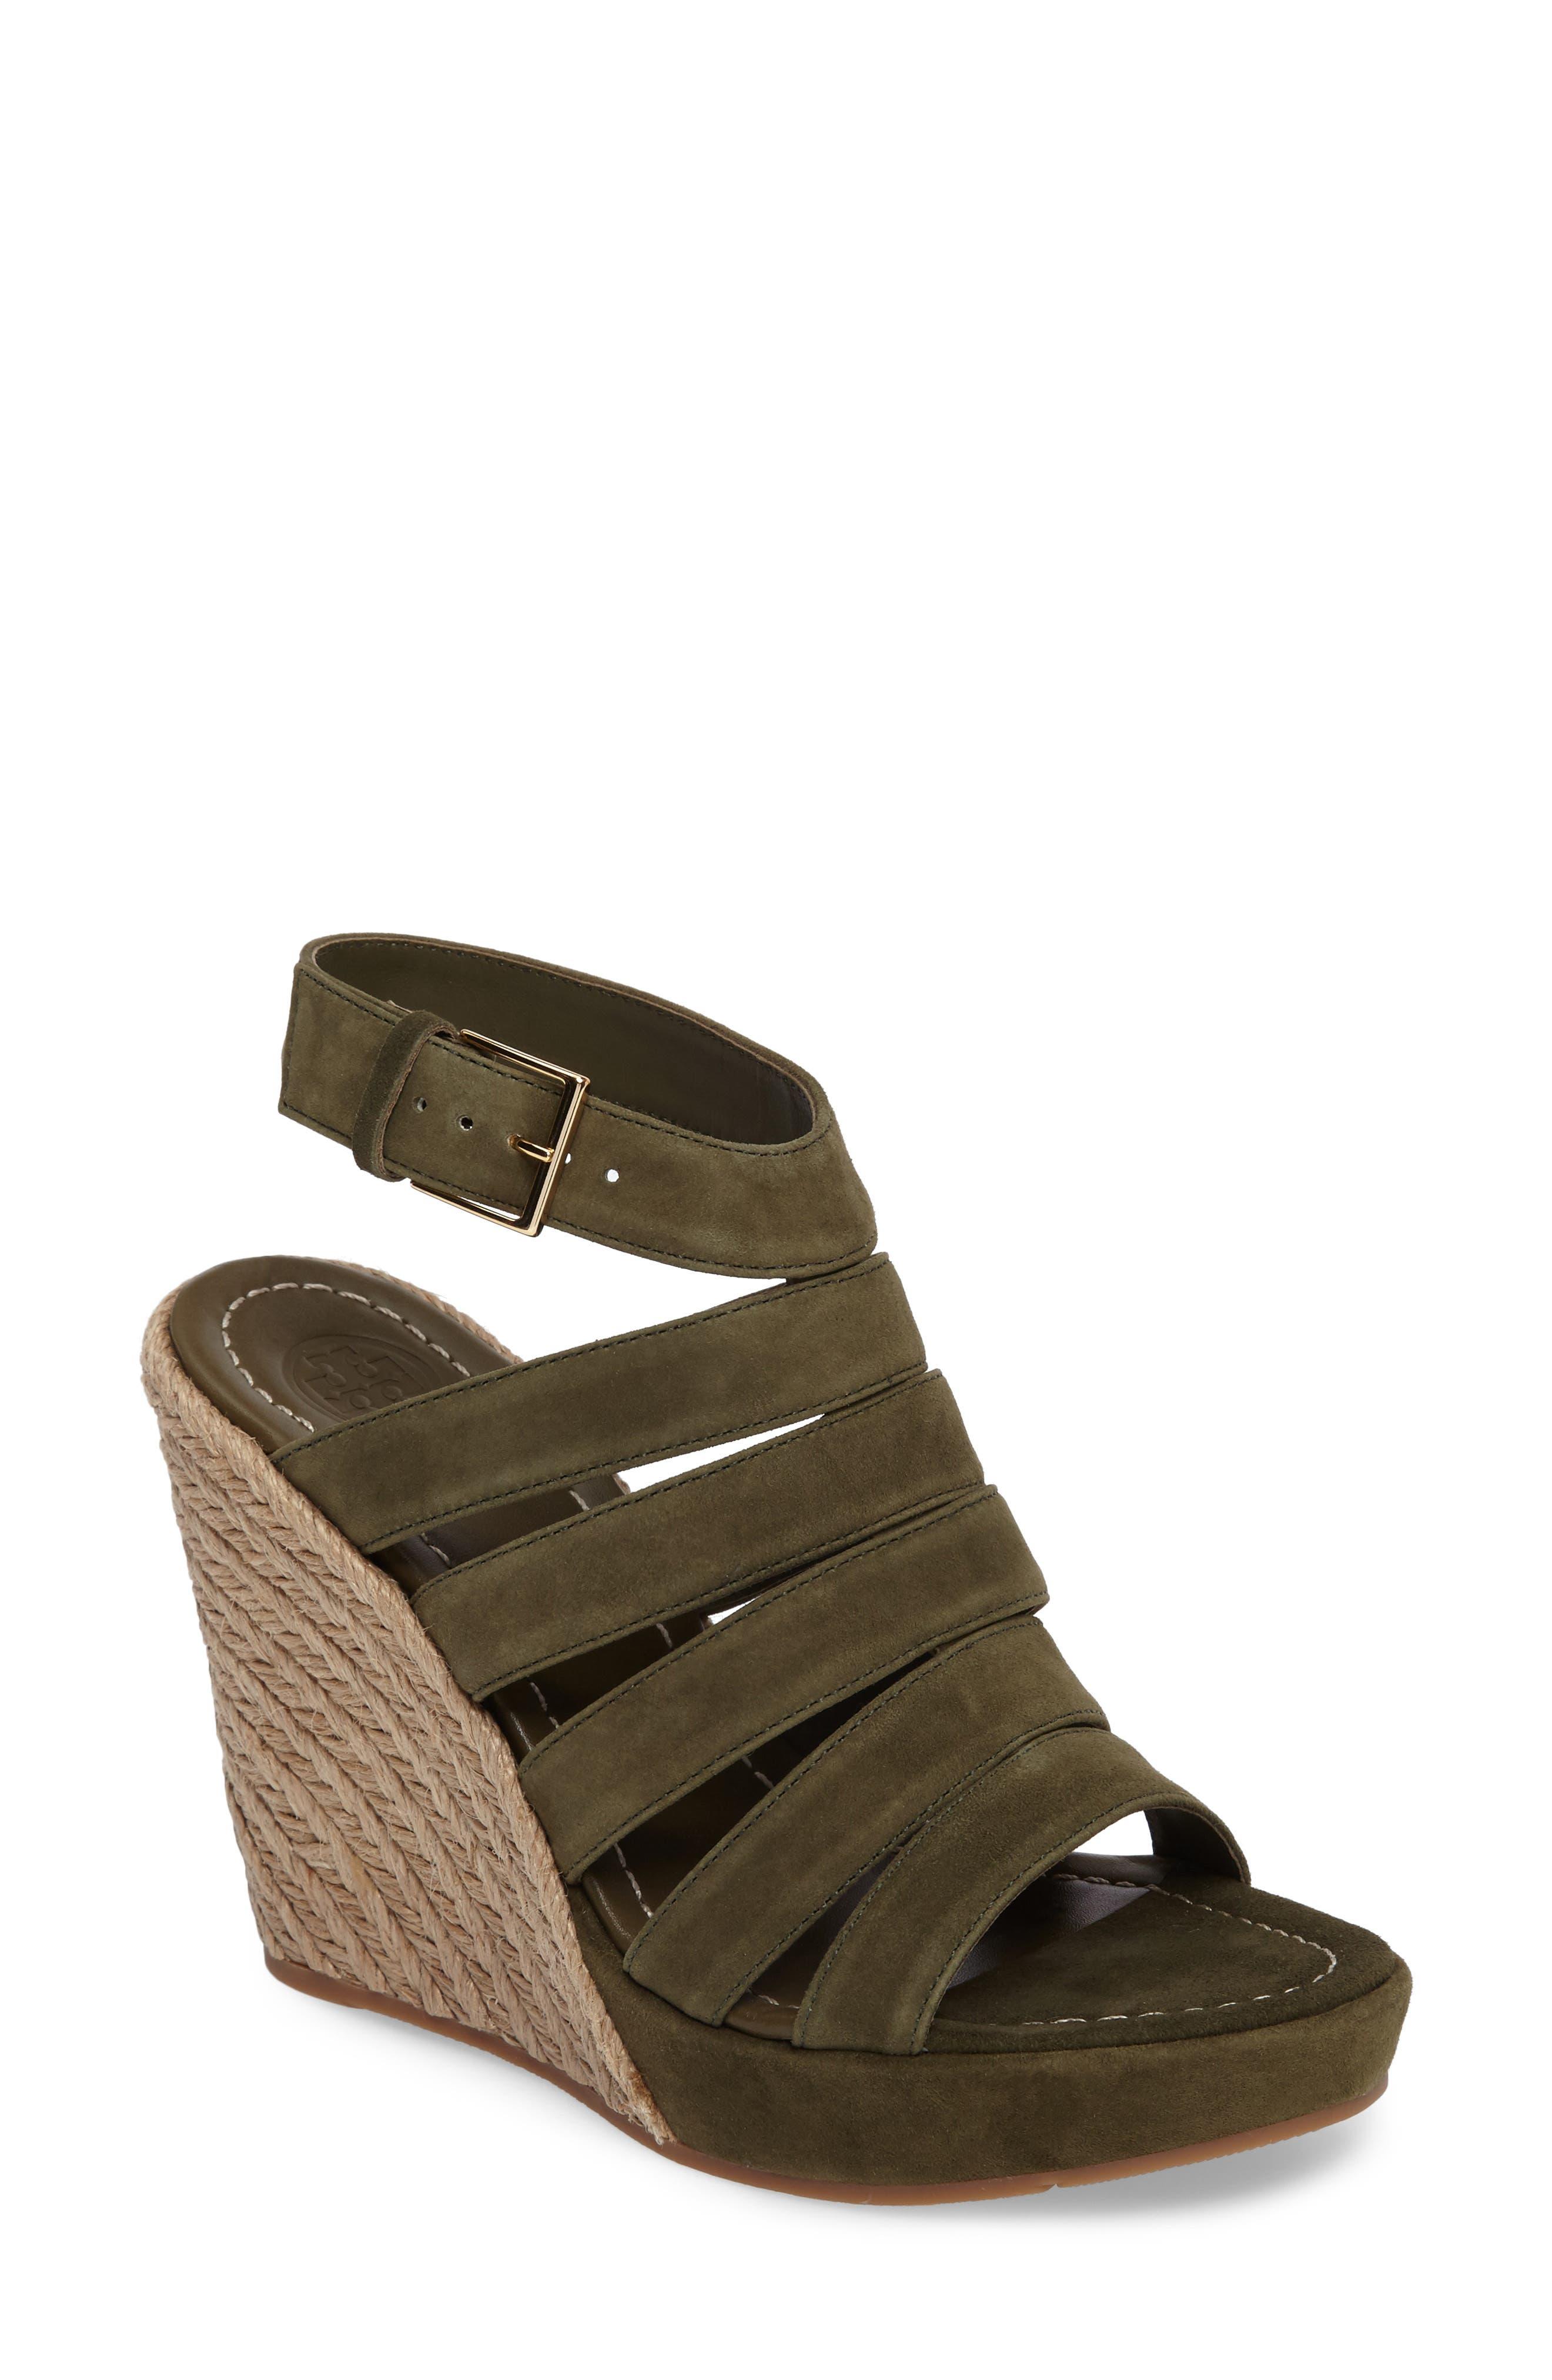 Tory Burch Bailey Wedge Sandal (Women)